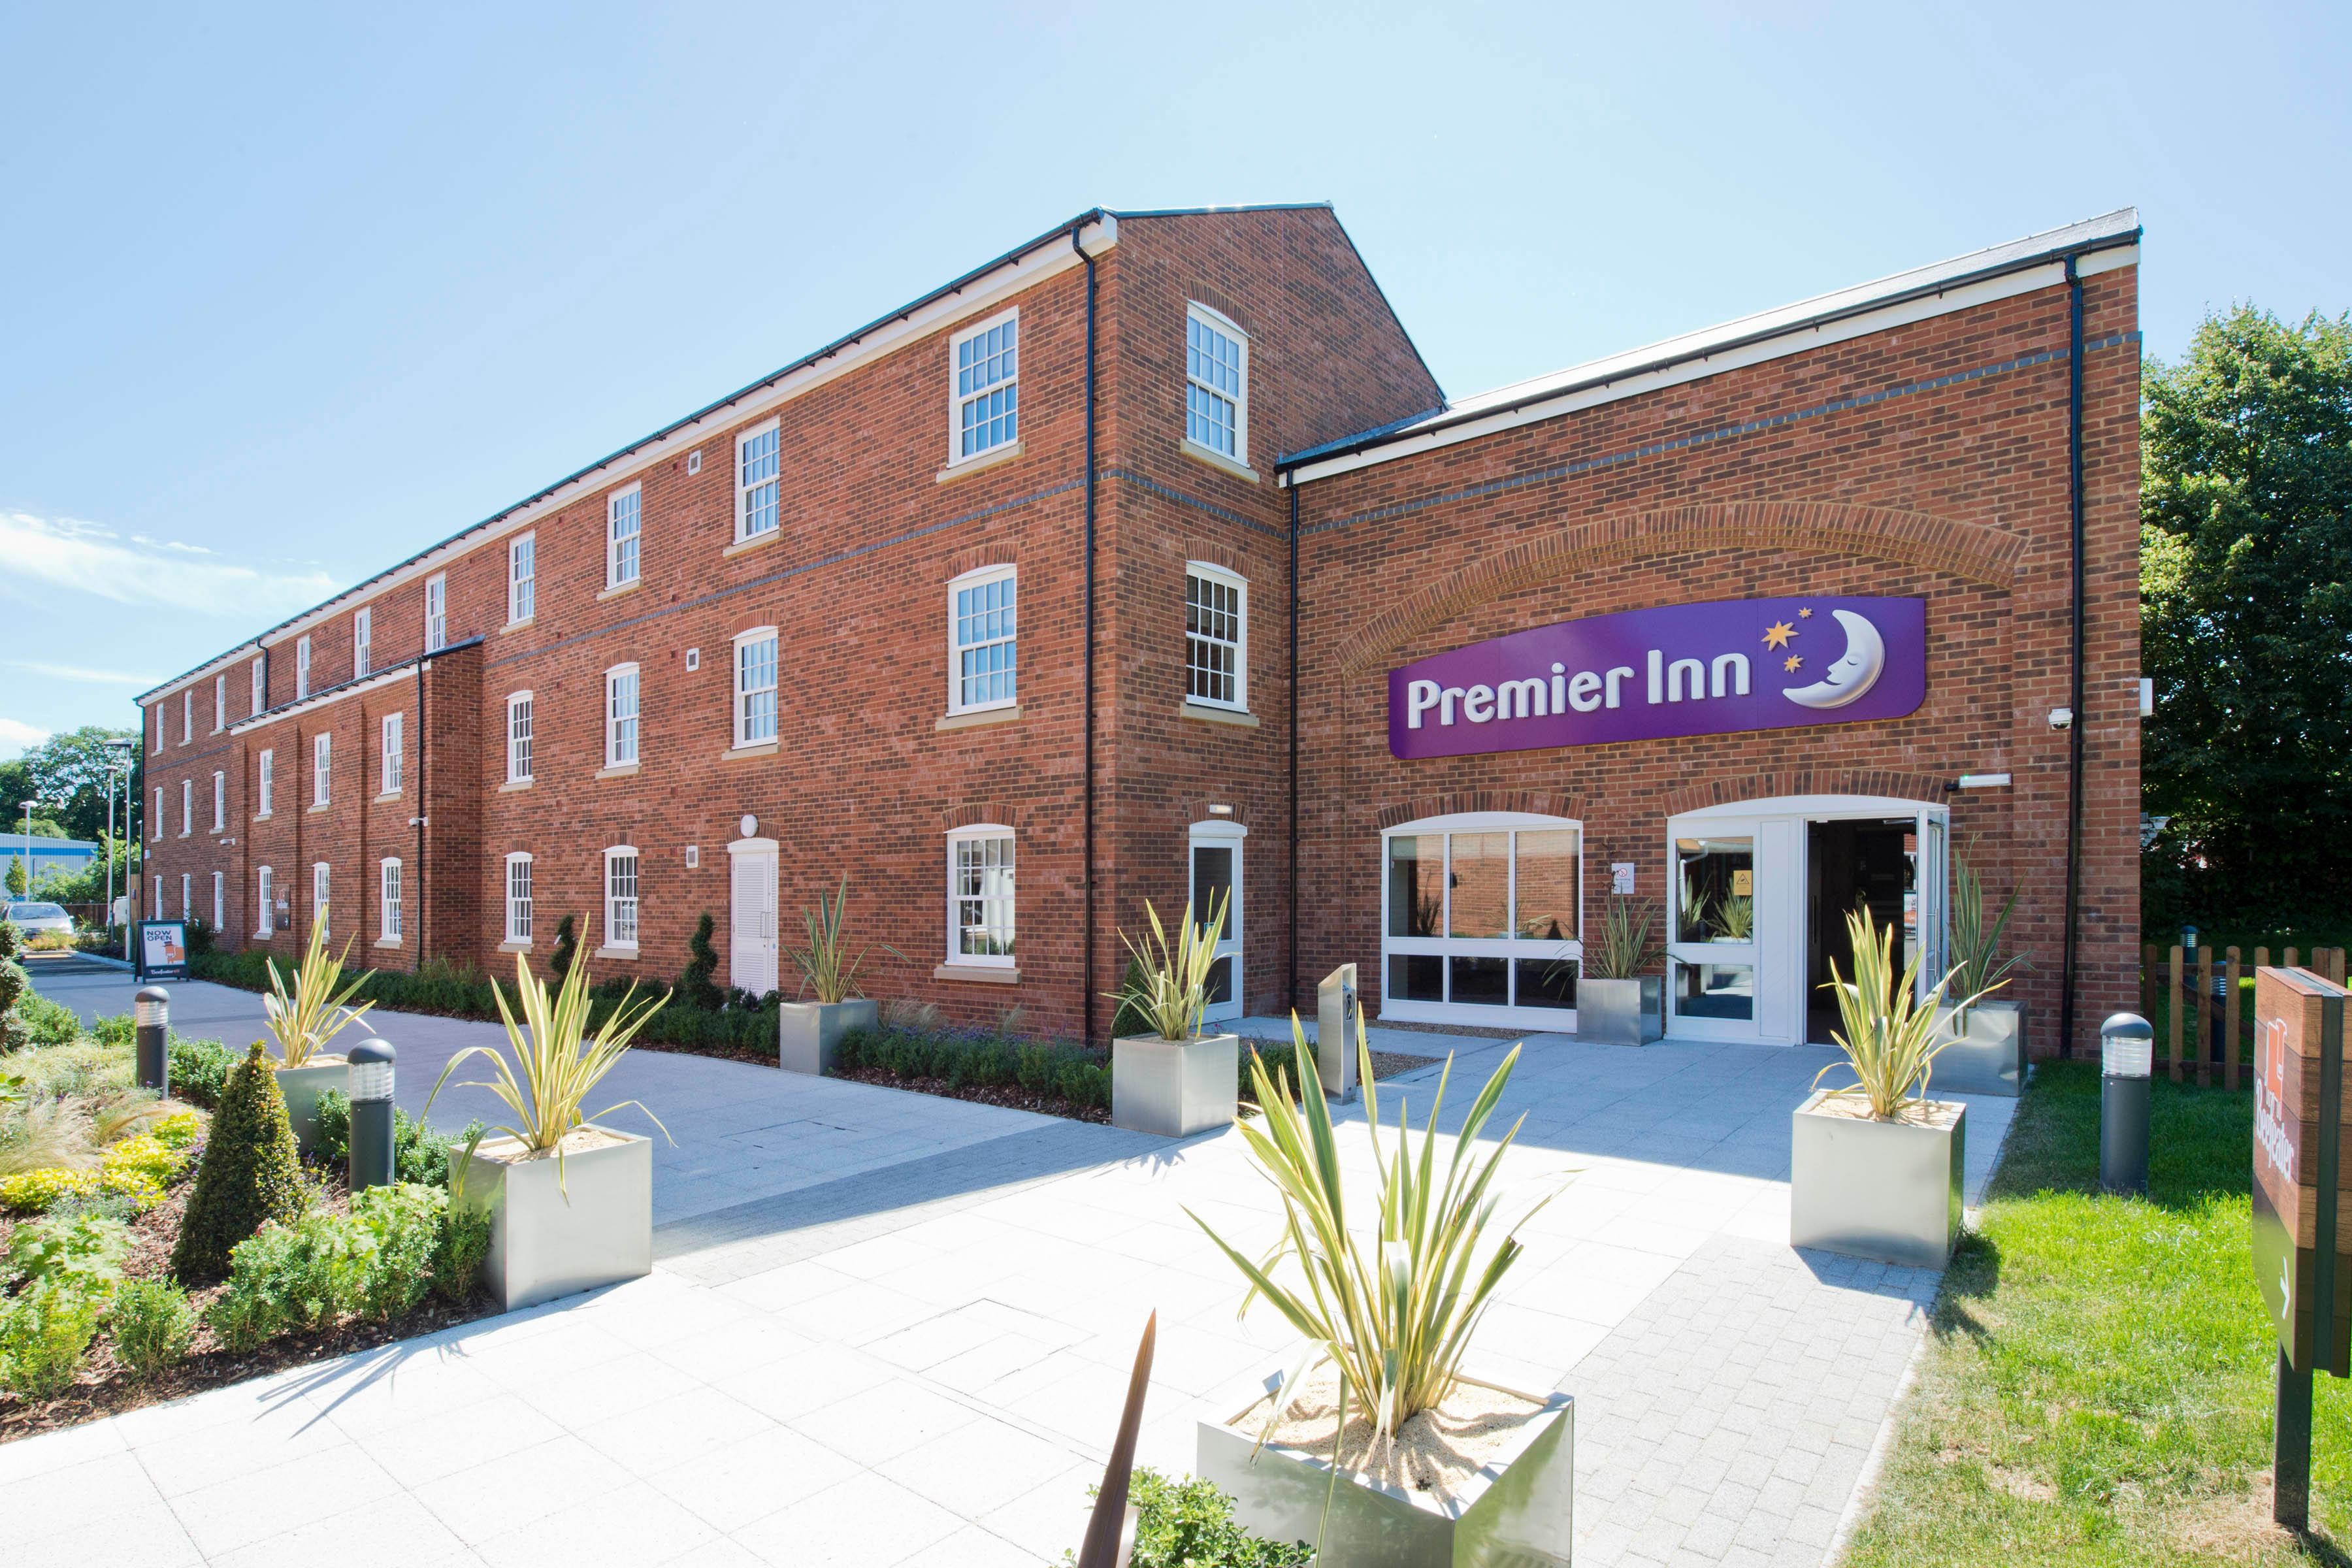 Premier Inn Farnham hotel